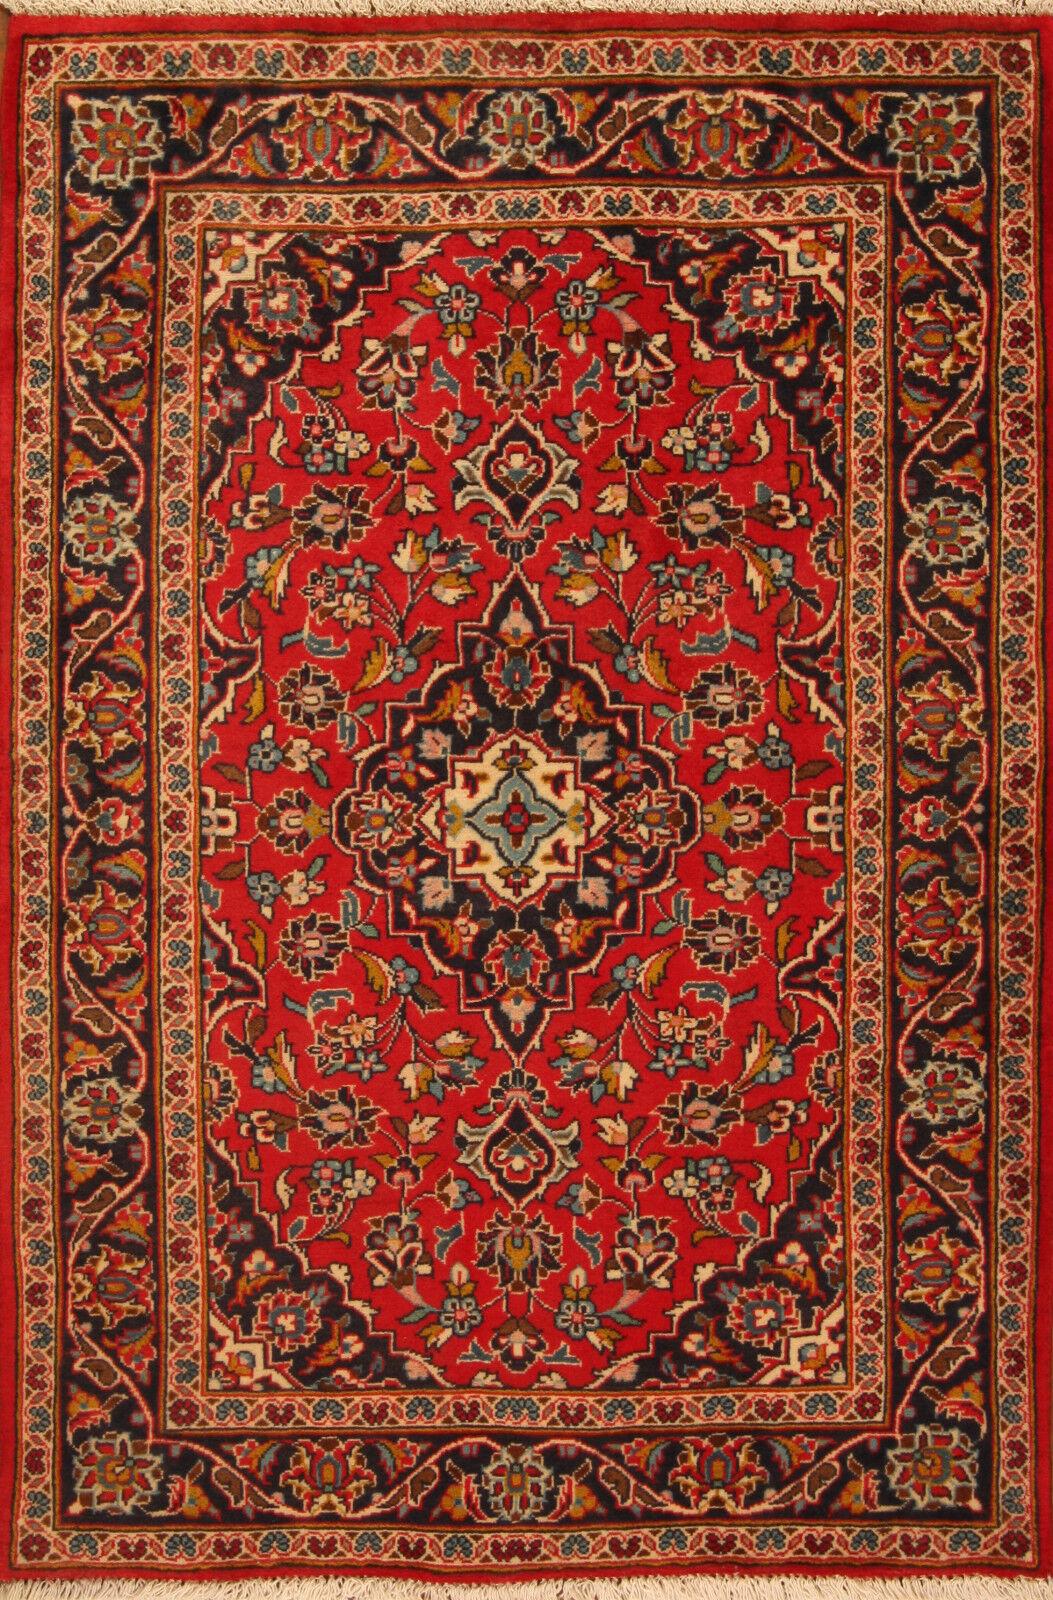 TAPPETO Orientale Vero Annodato Tapis persan n. n. n. 4189 (152 x 104) cm Ponte 97273b